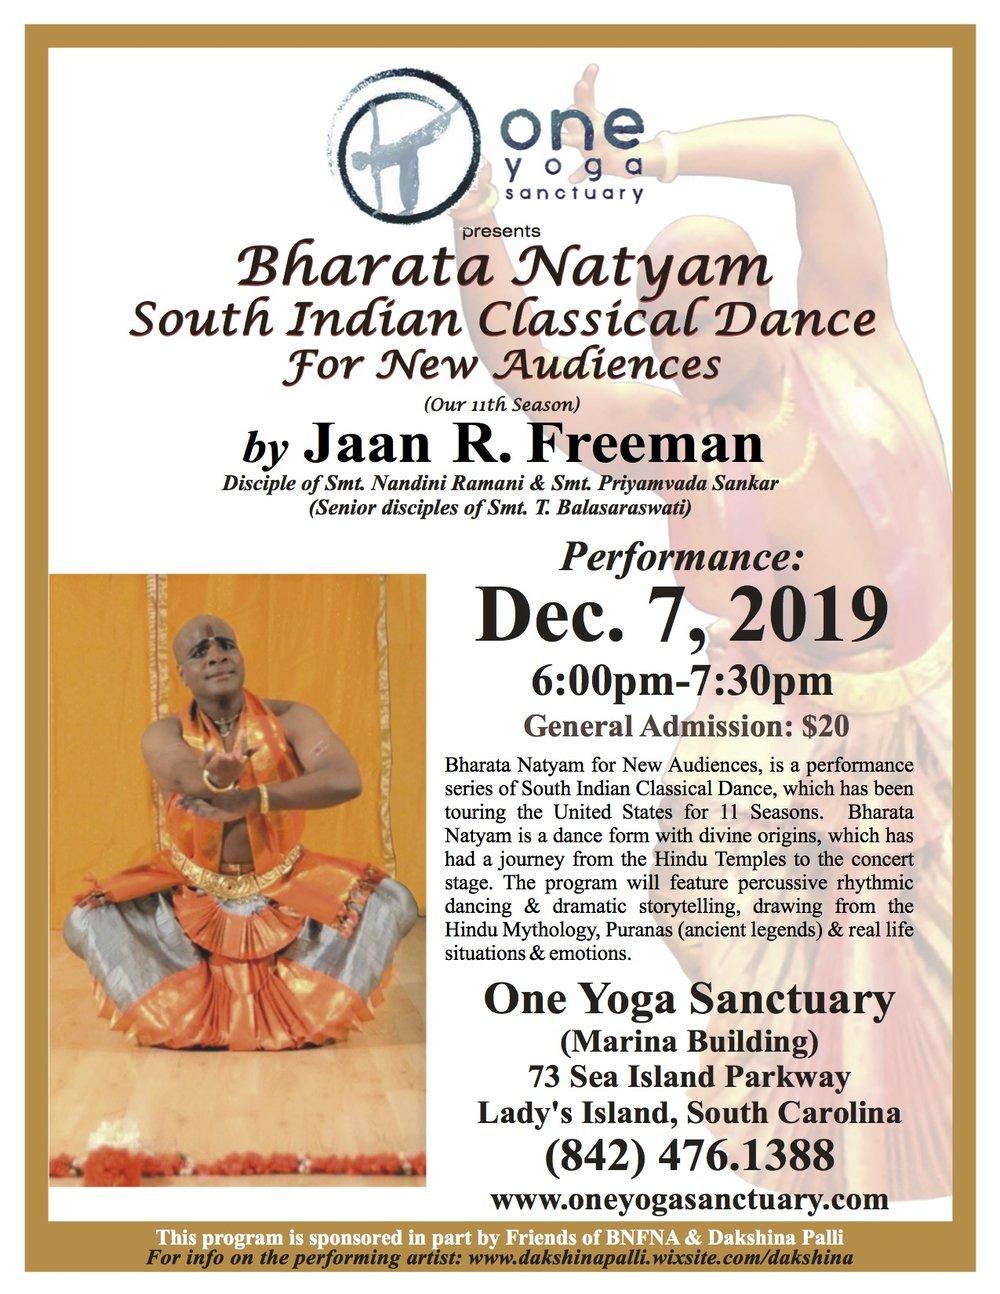 Upcoming News One Yoga Sanctuary